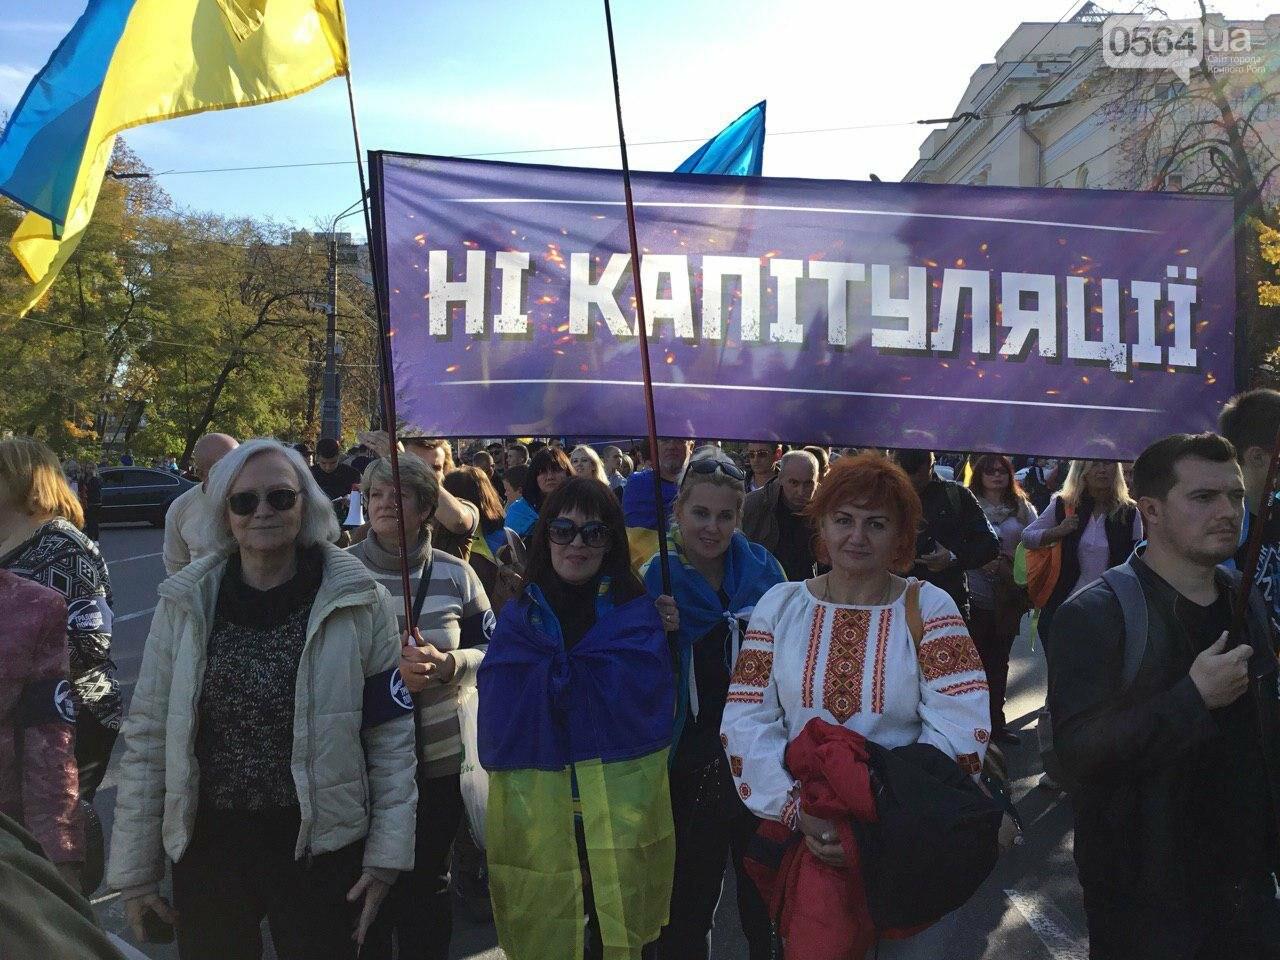 Криворожане поддержали Марш сопротивления капитуляции в Киеве, - ФОТО, ВИДЕО, ОБНОВЛЕНО, фото-1